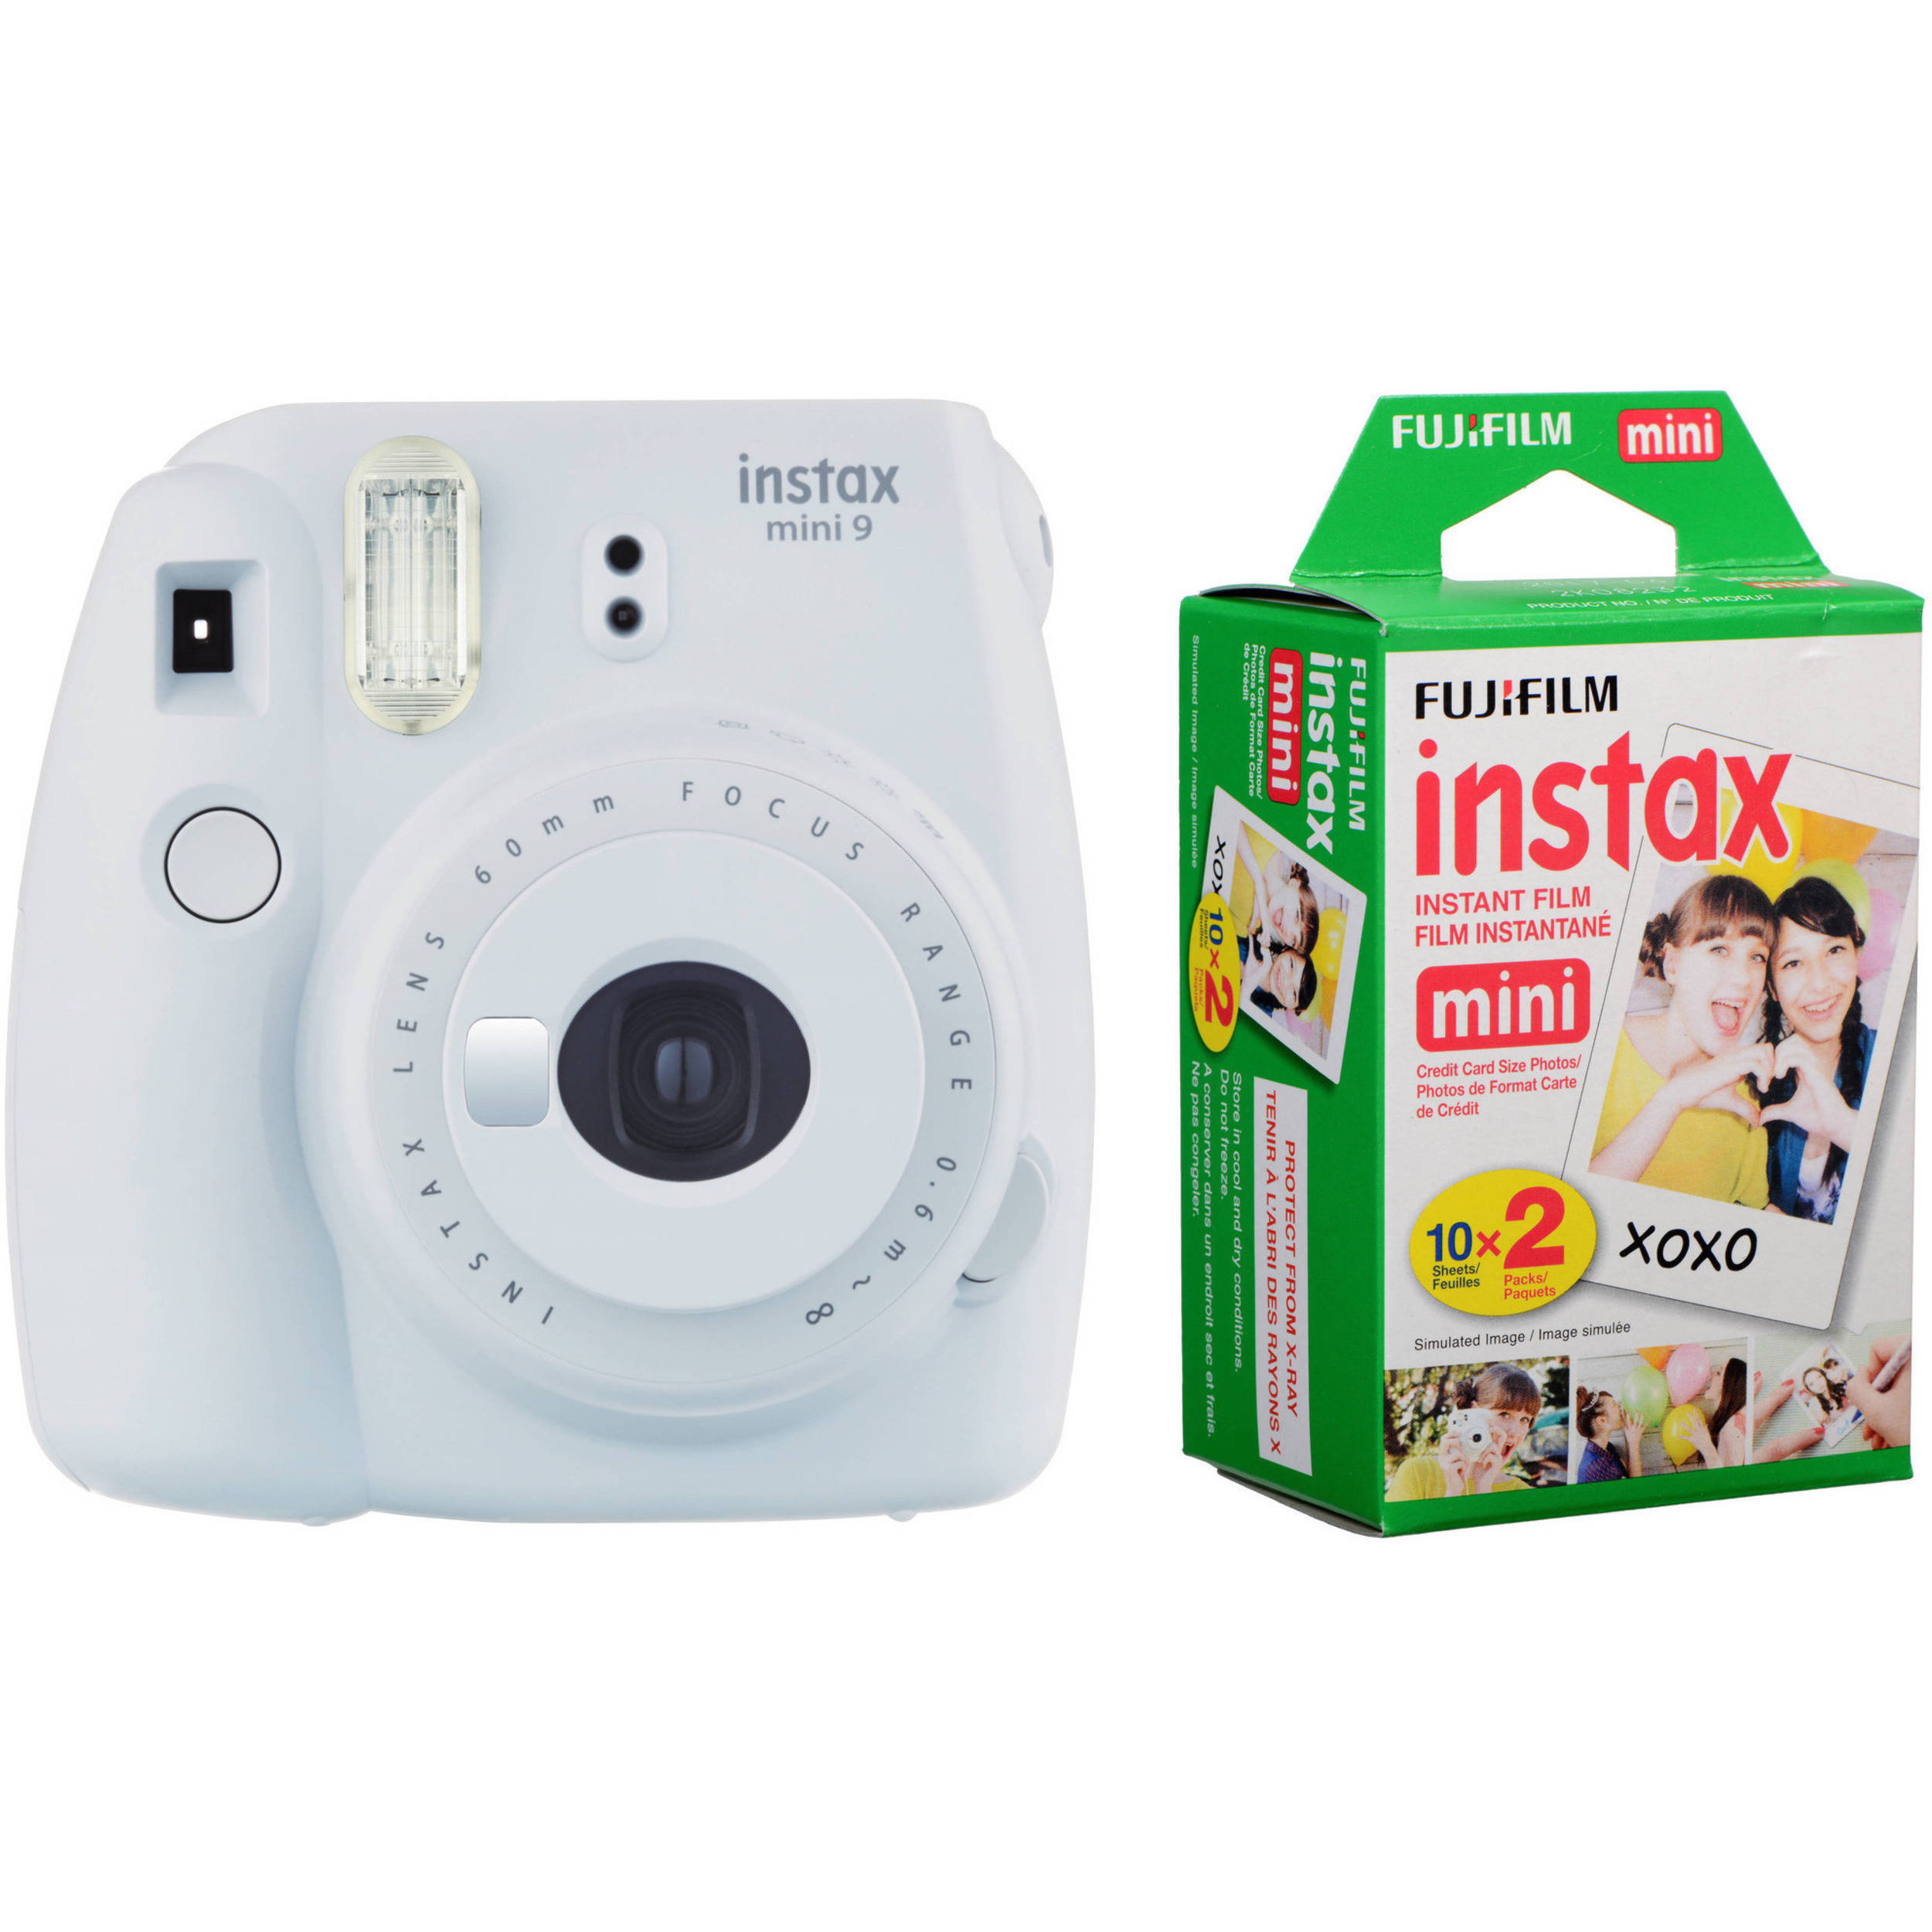 Fujifilm instax mini 9 Instant Film Camera with Instant Film B&H